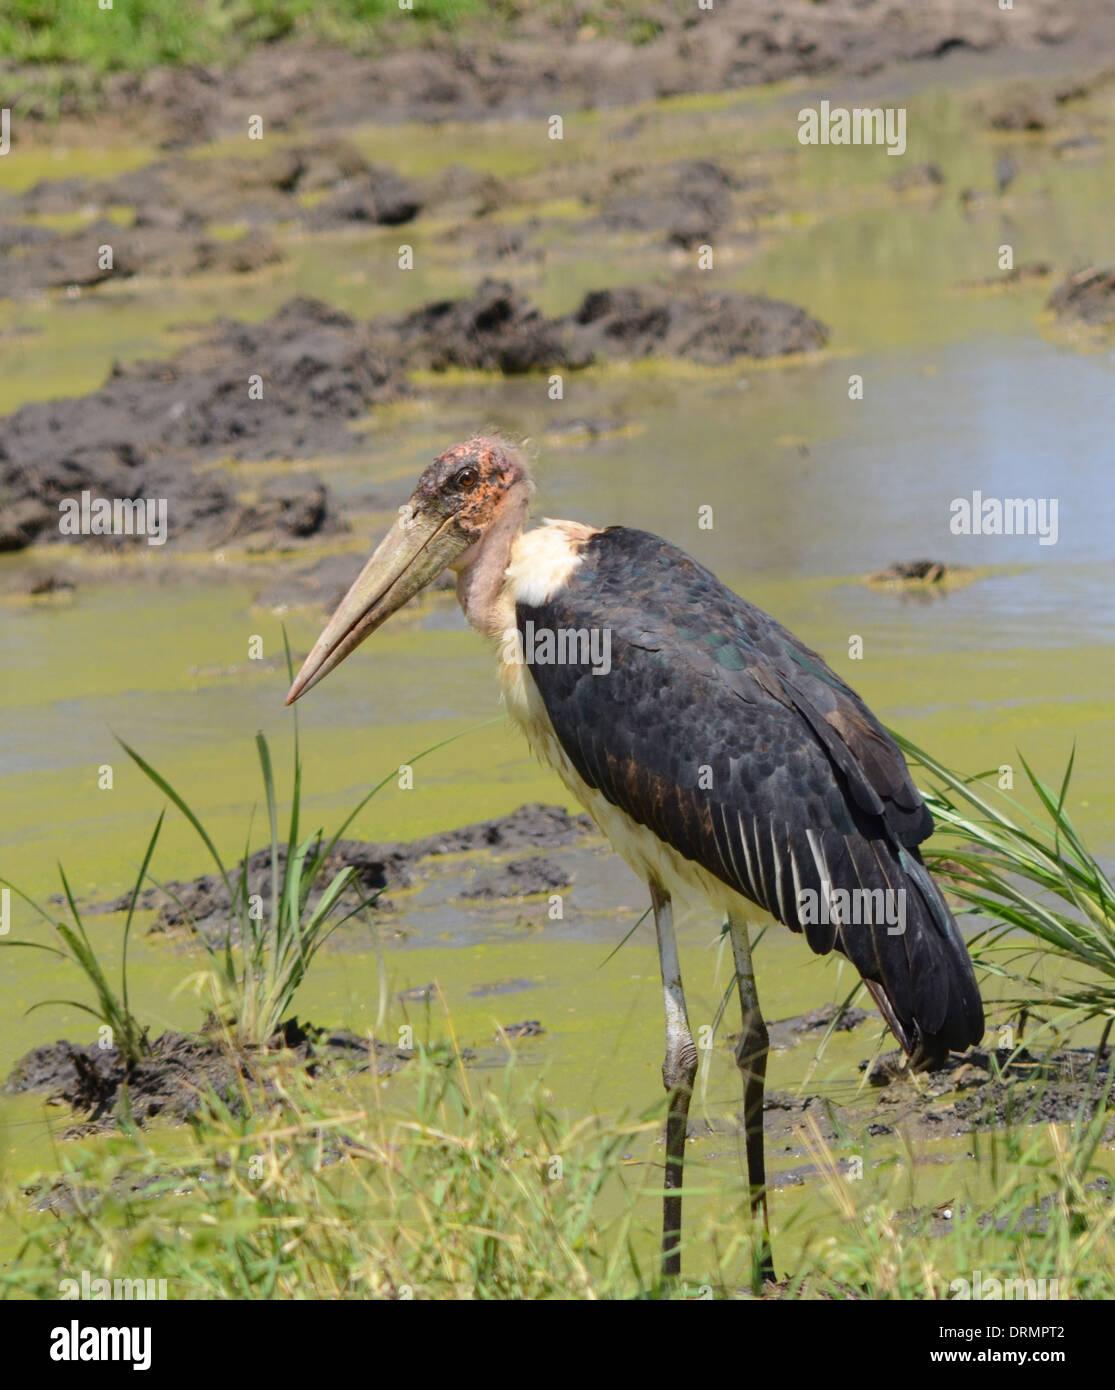 Marabu Stalk standing in a mud hole Stock Photo